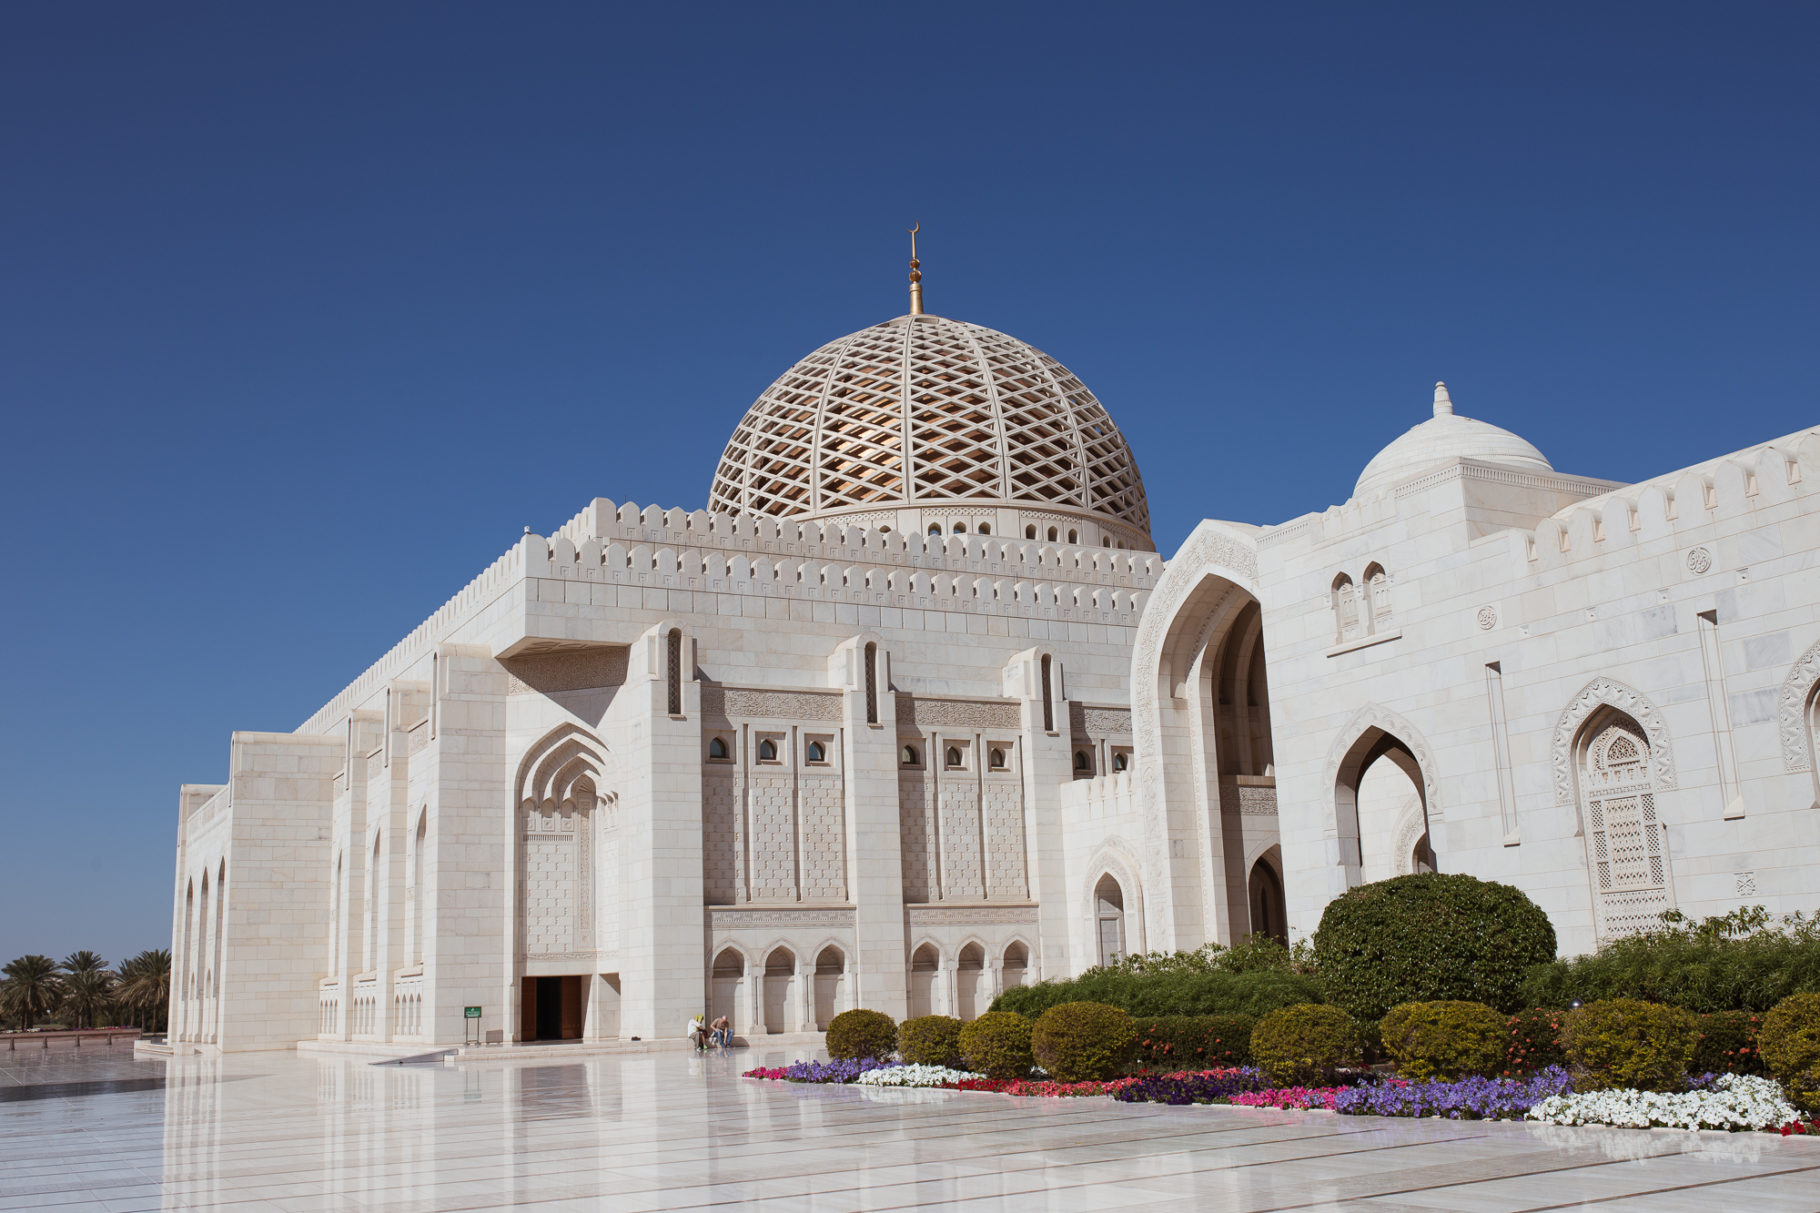 Things To Do In Oman (Oman Travel Guide) - Bikinis & Passports